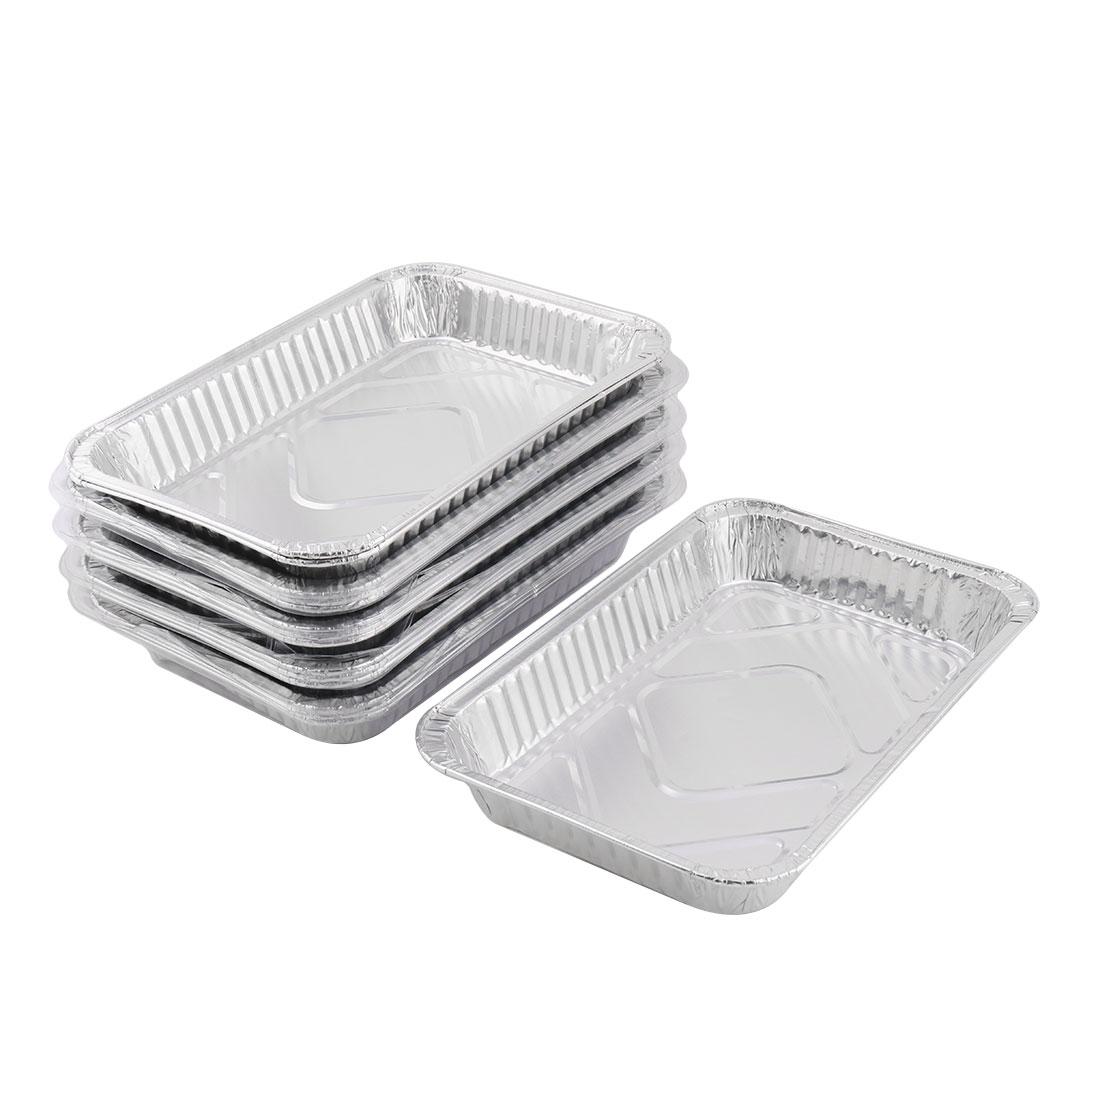 Family Kitchen Aluminum Foil Rectangular Food Container Silver Tone 1800ml 15pcs